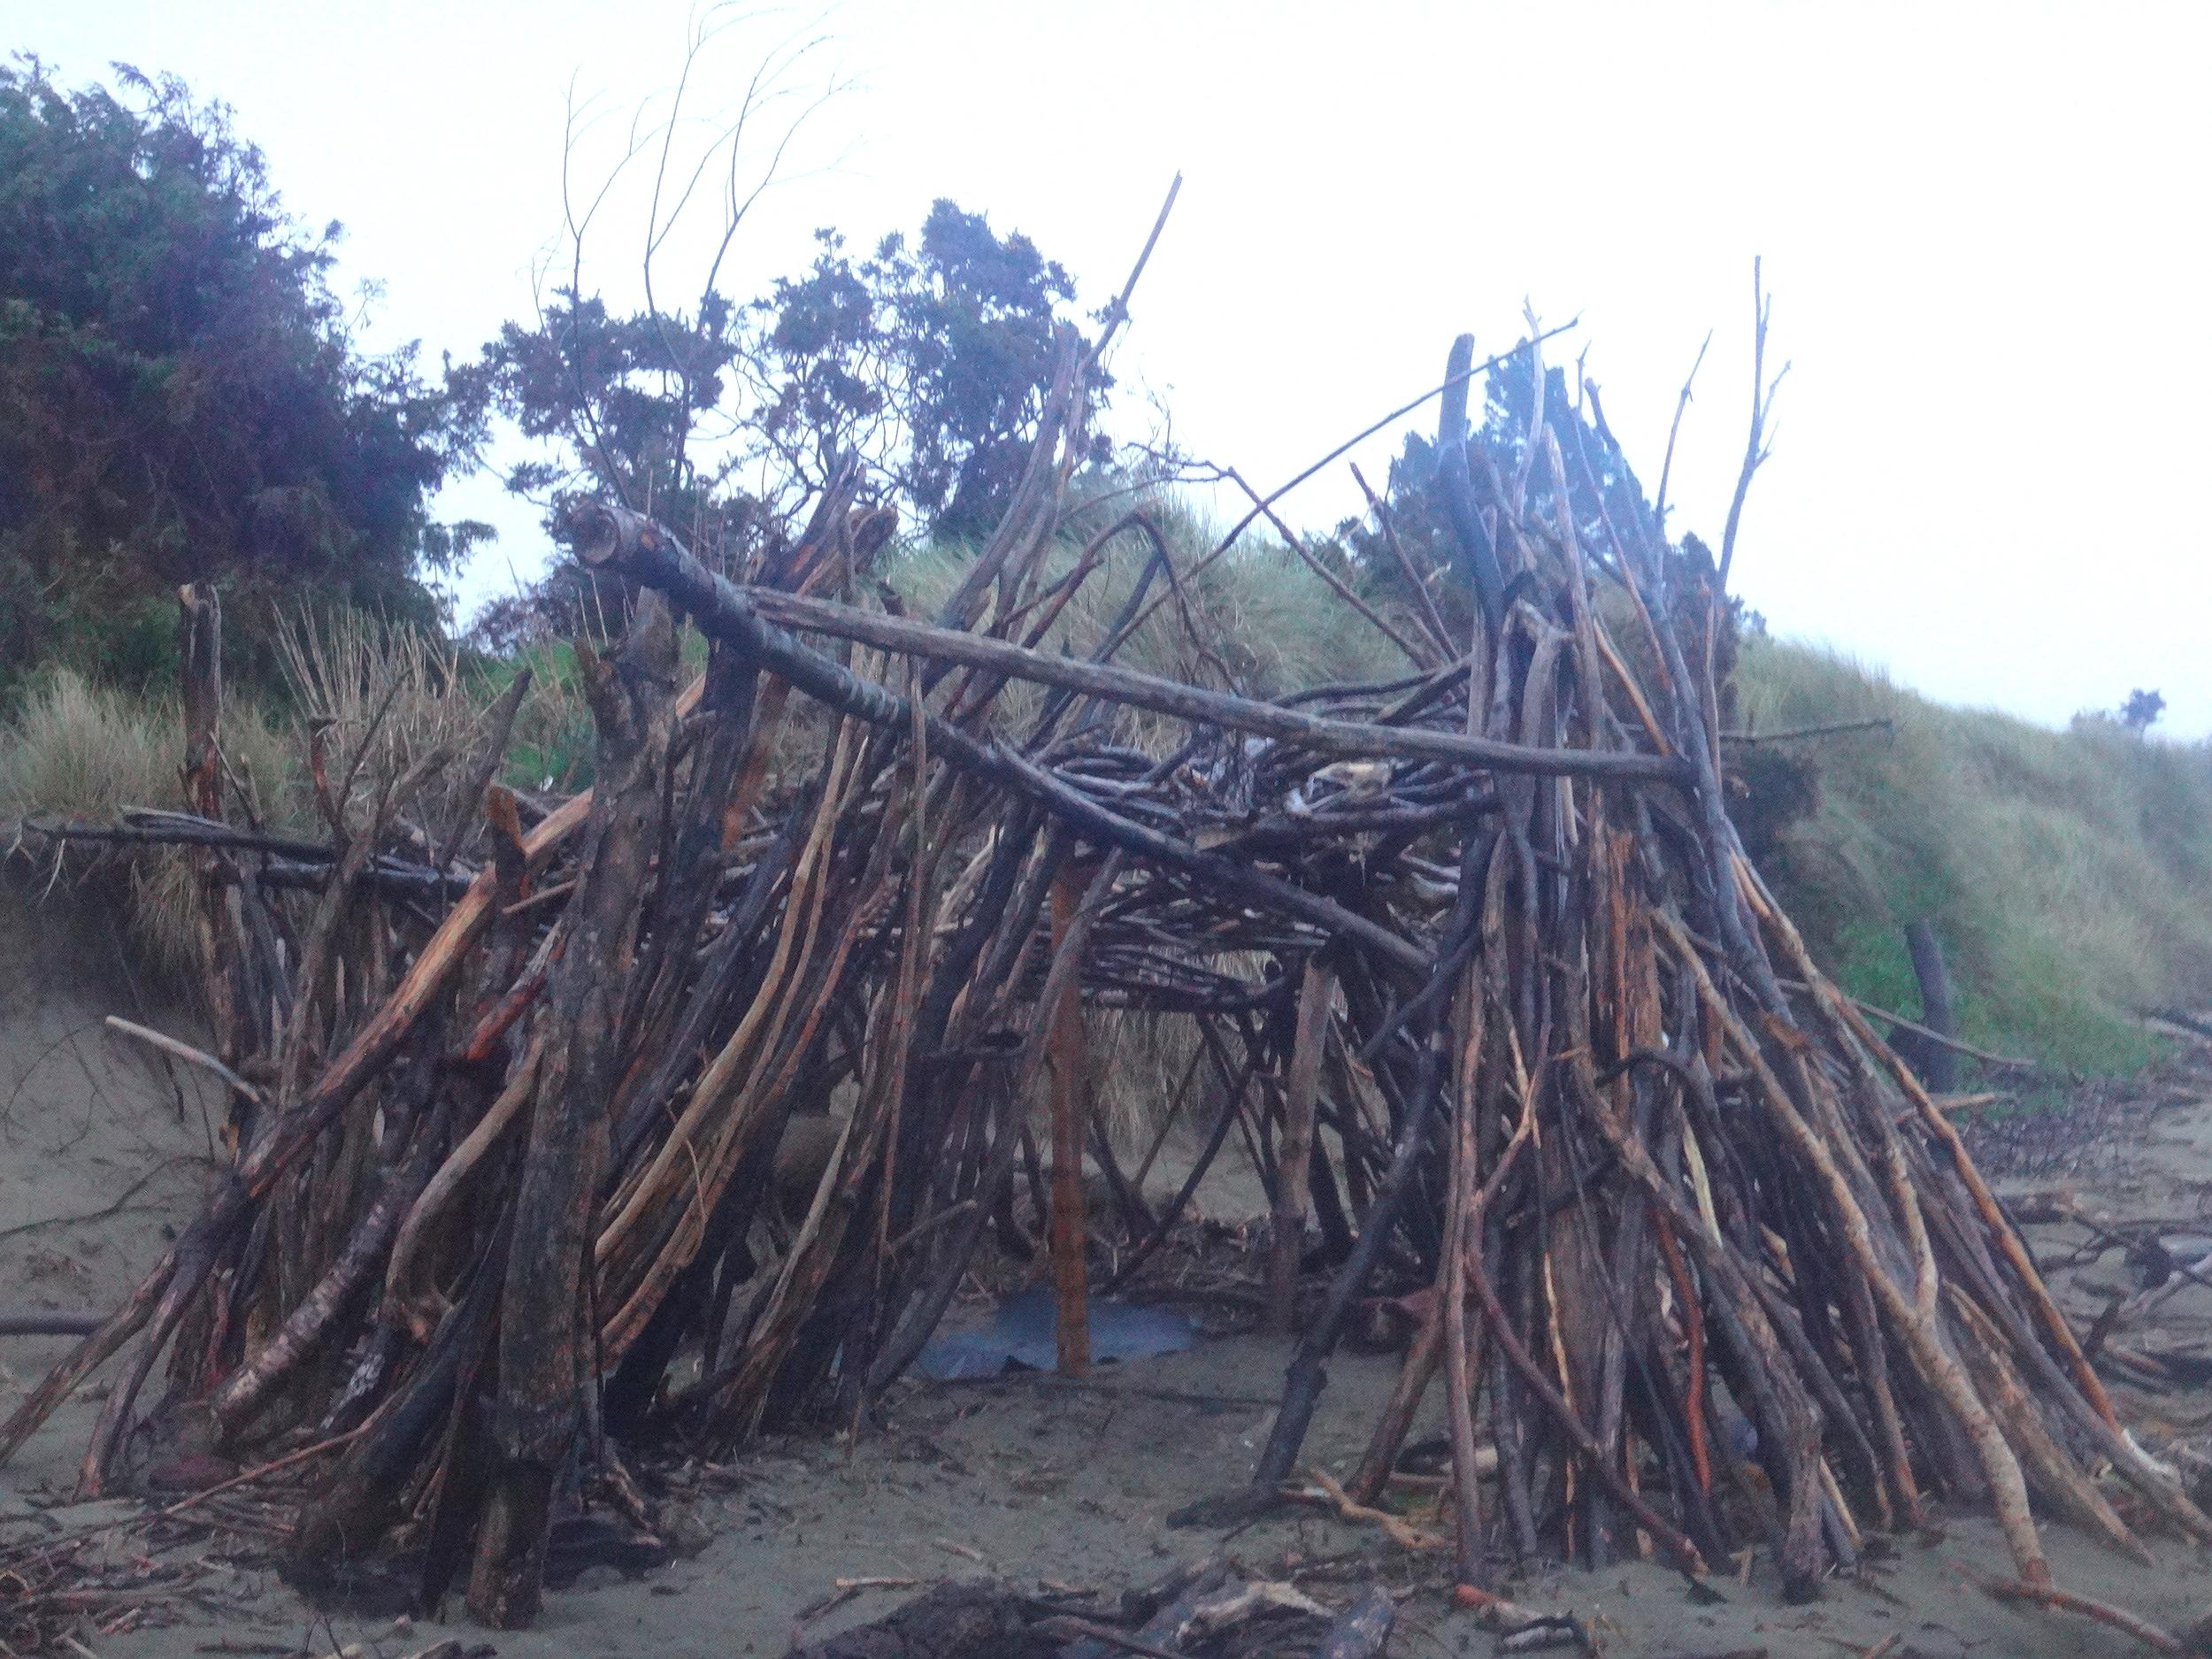 My driftwood shack.